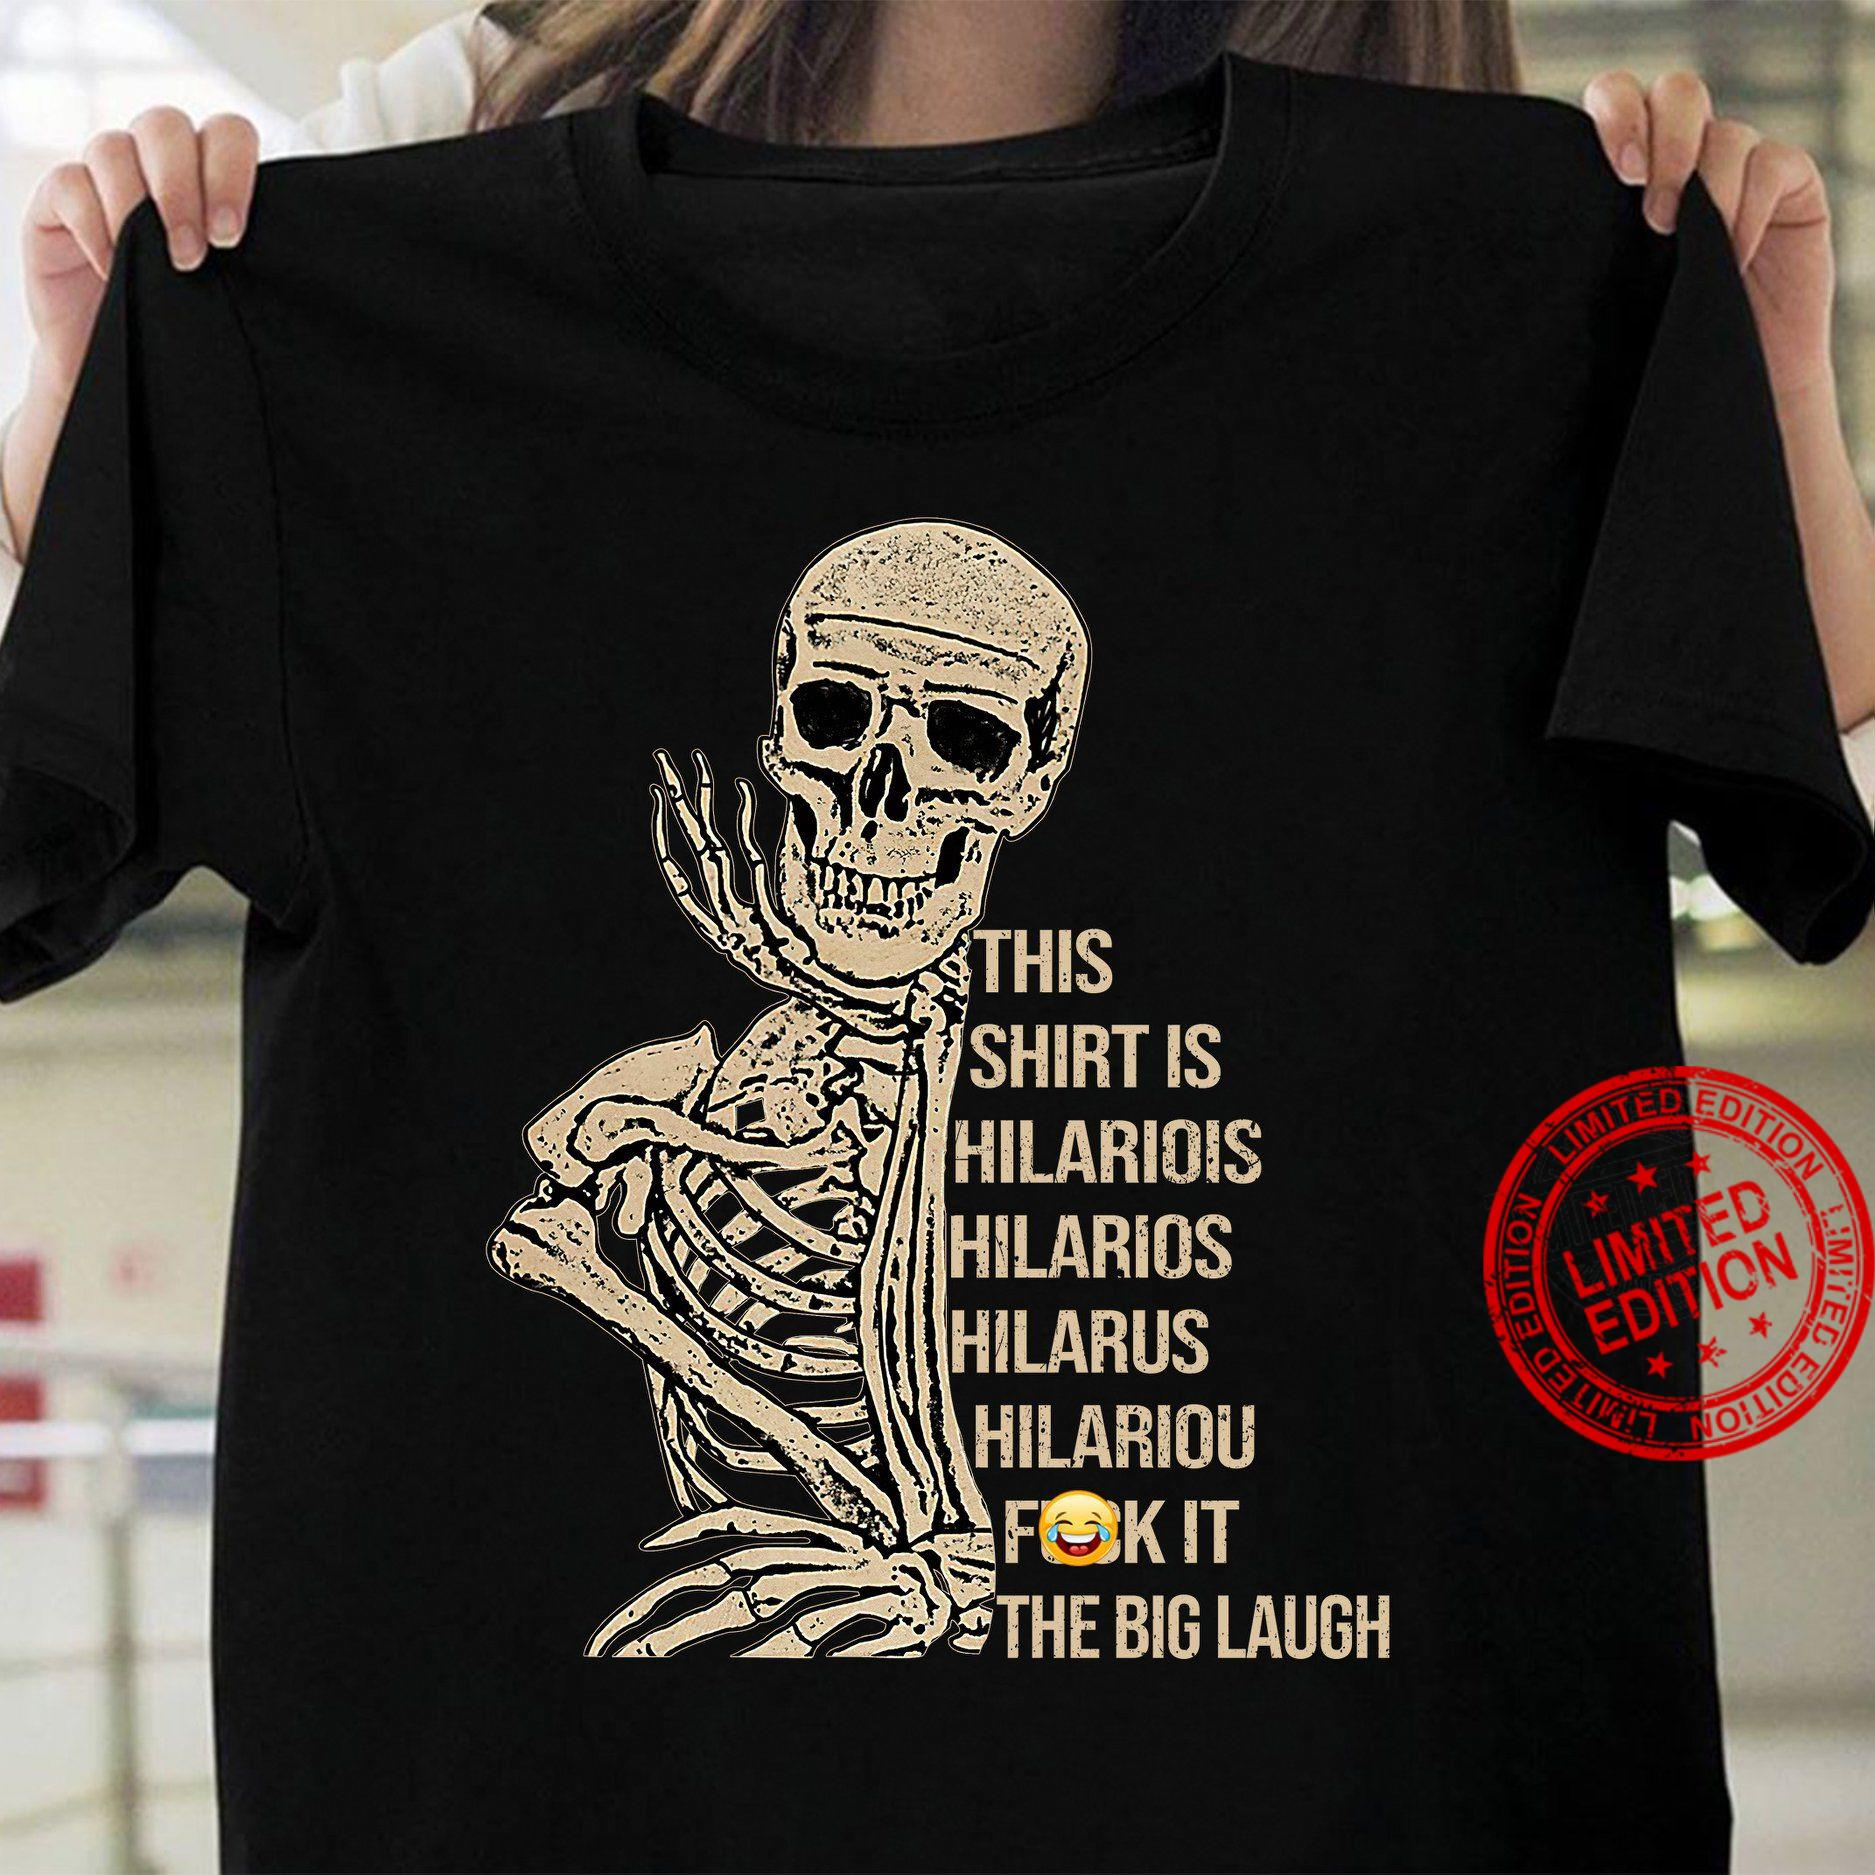 Skeleton This Shirt Is Hilariois Hilarios Hilarus Hilariou Fuck It The Big Laugh Shirt